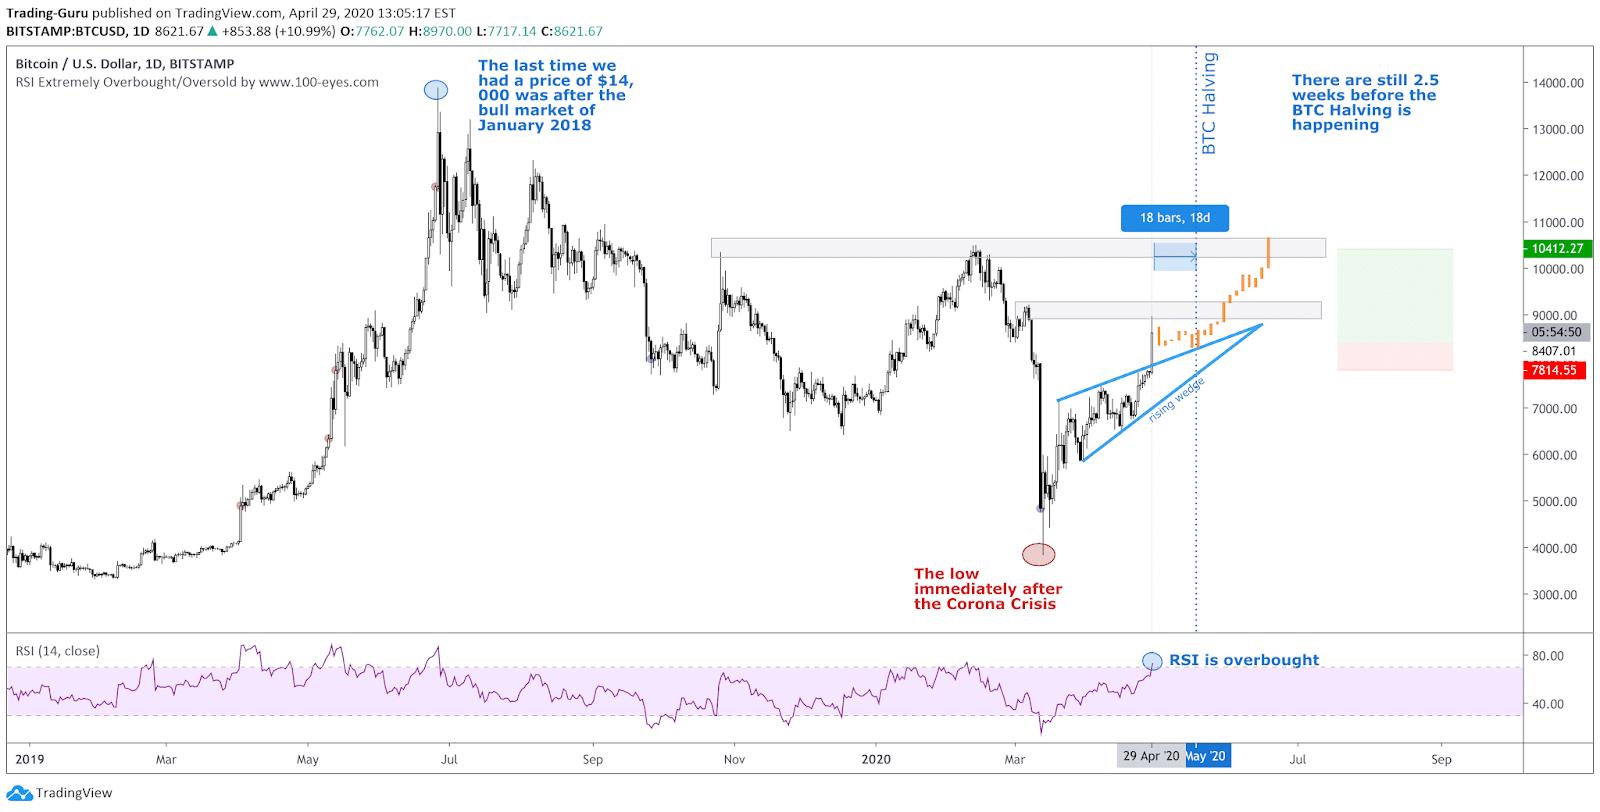 BTC tradingview